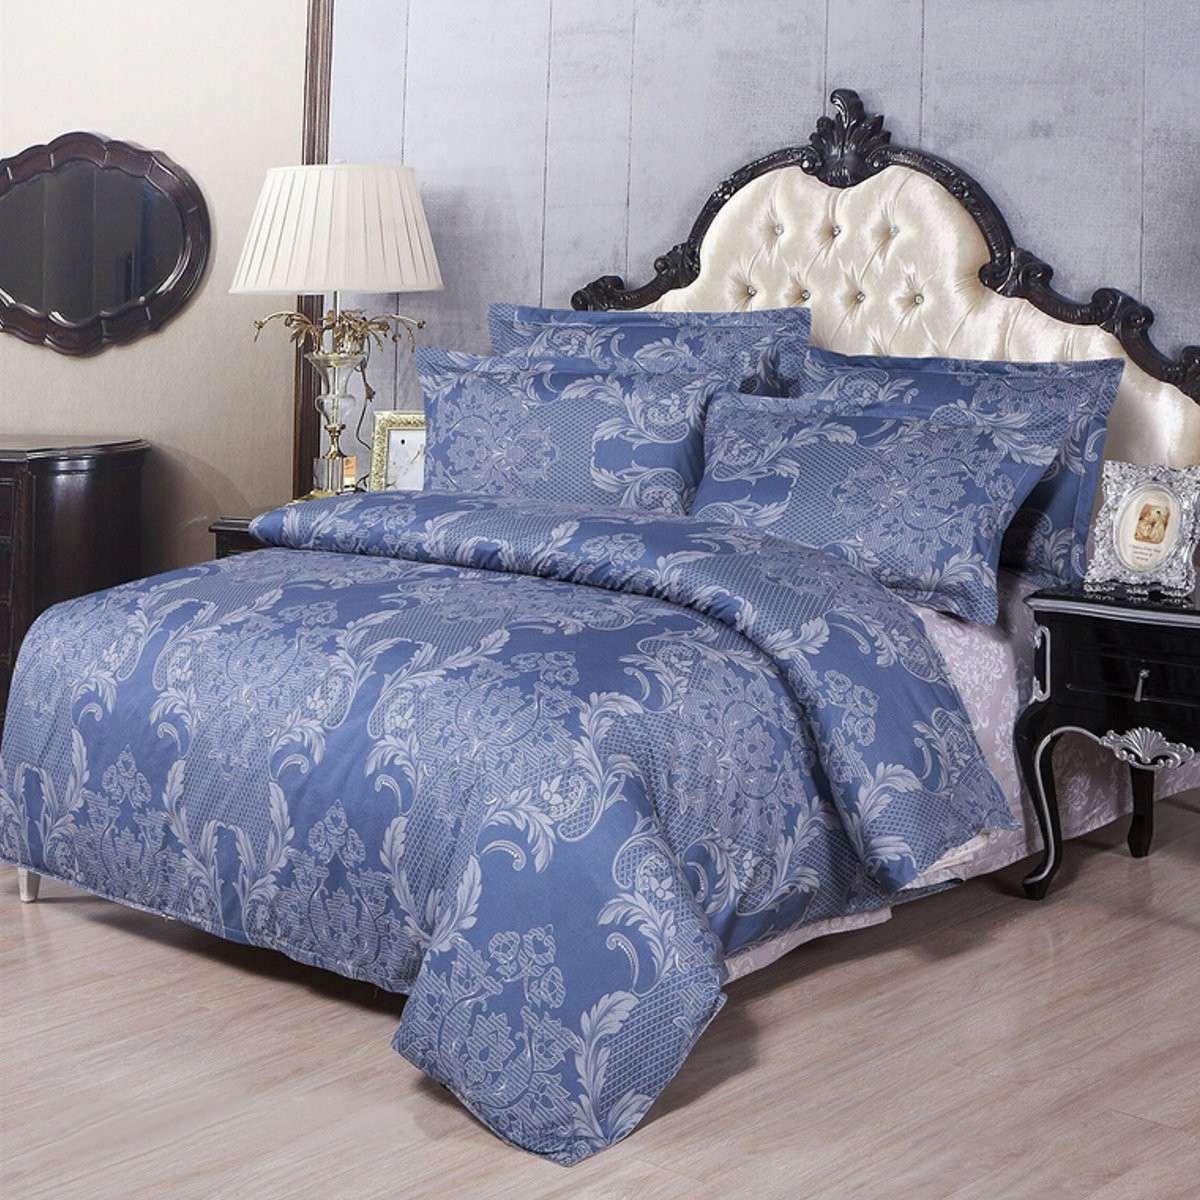 Vintage Pattern Blue Foral Print Bedding Sets Luxury Polycotton Pillowcases Quilt Duvet Cover Bedsheet Single Double King Size